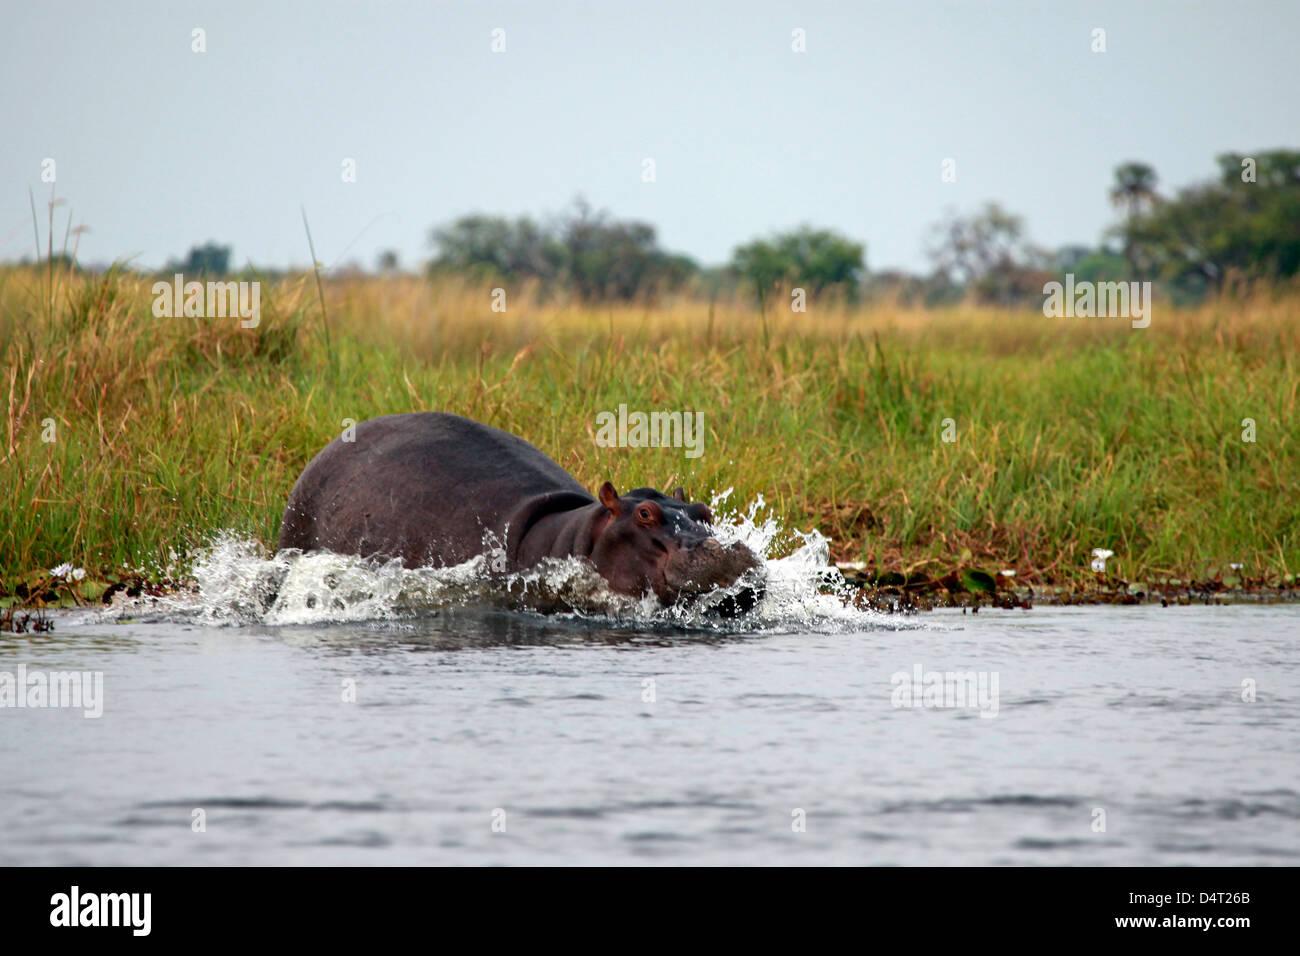 Botswana, Okavango Delta. Hippo of the Okavango Delta. - Stock Image